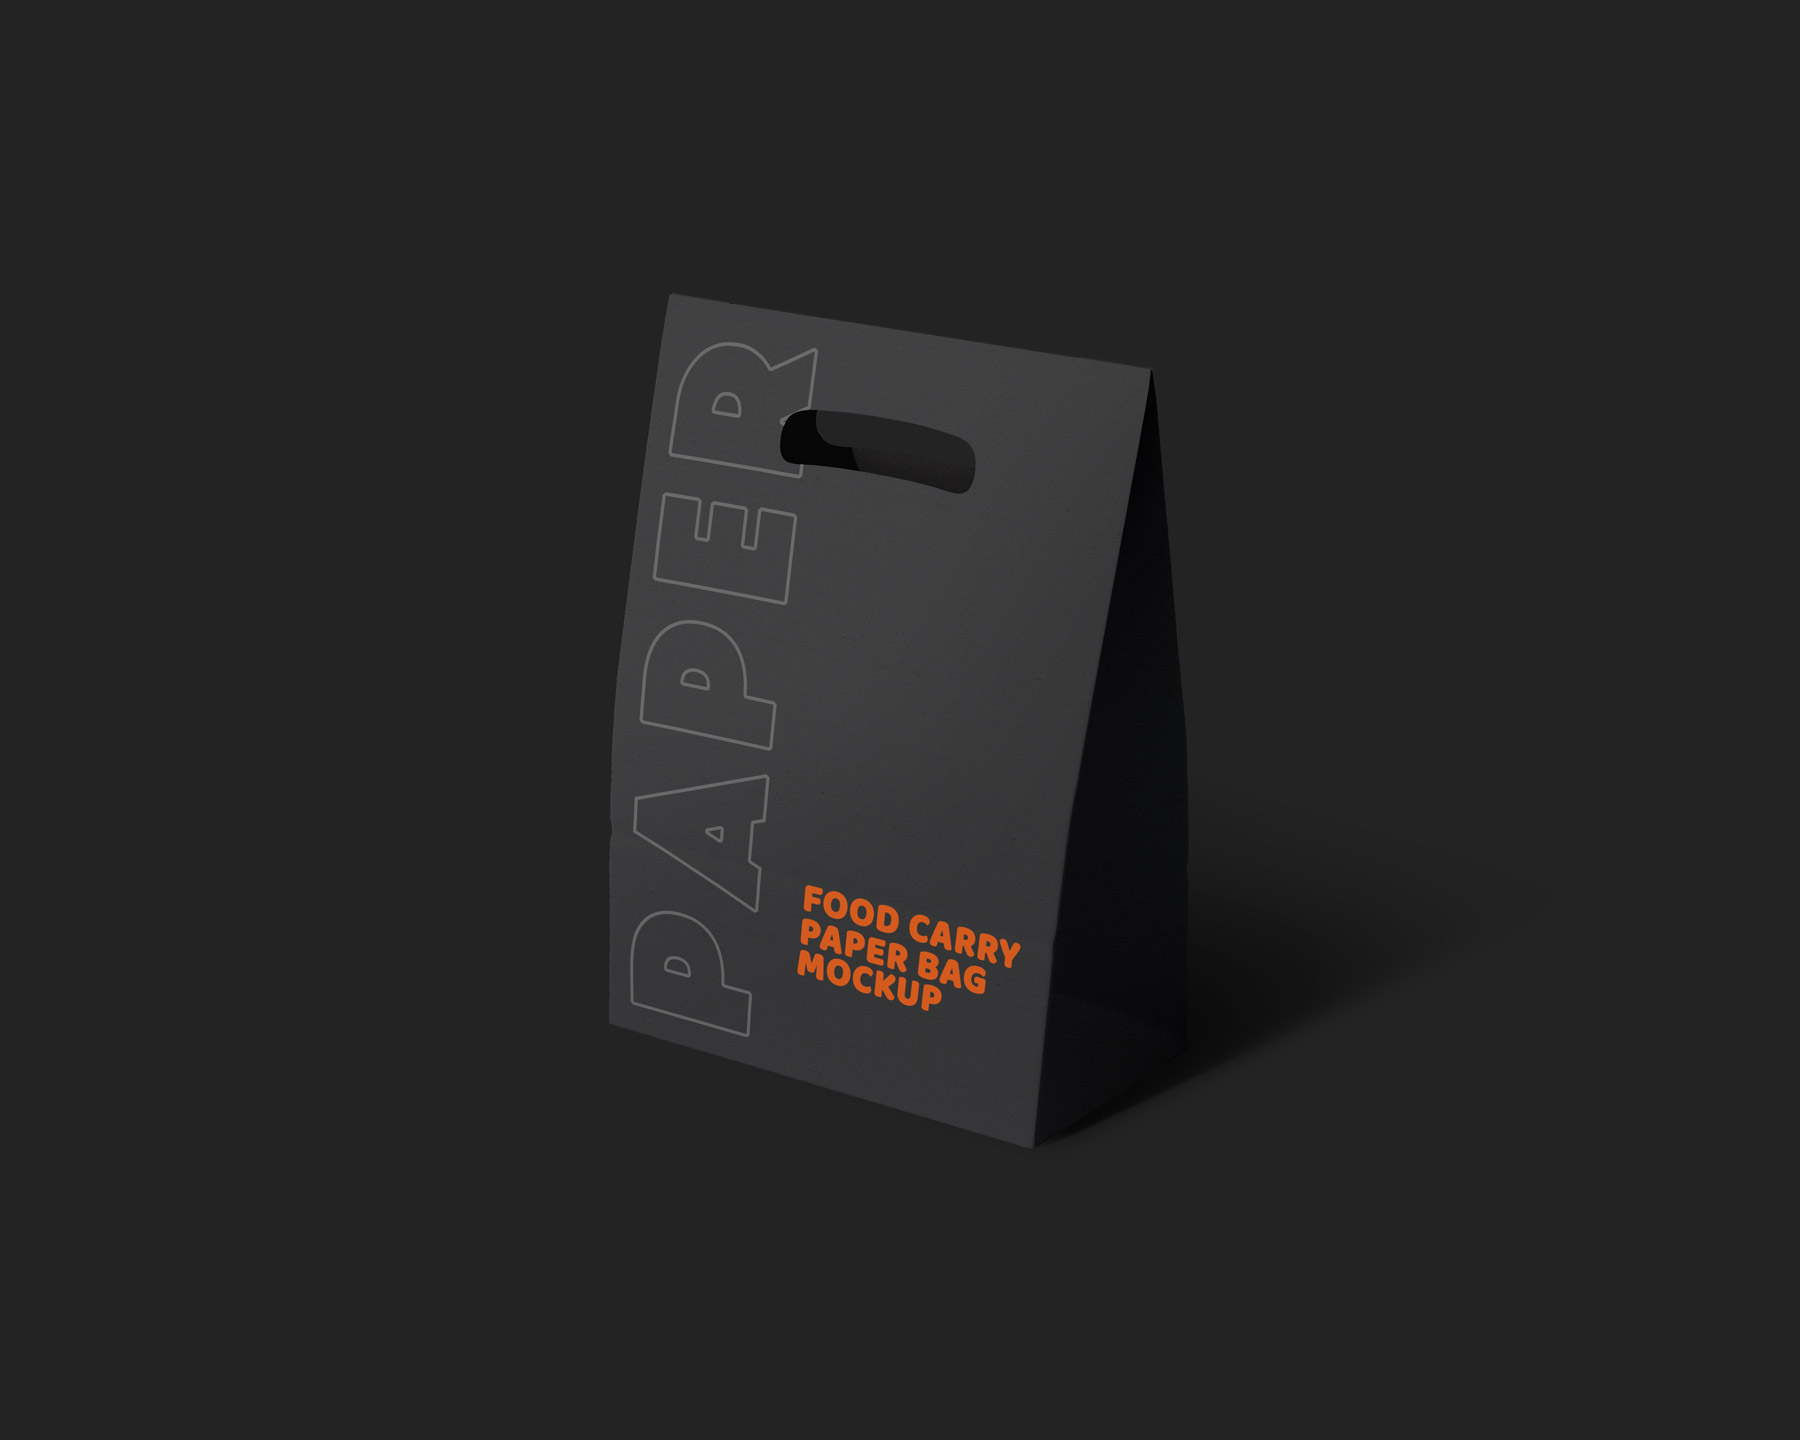 Dark Packaging Paper Carry Bag Mockup